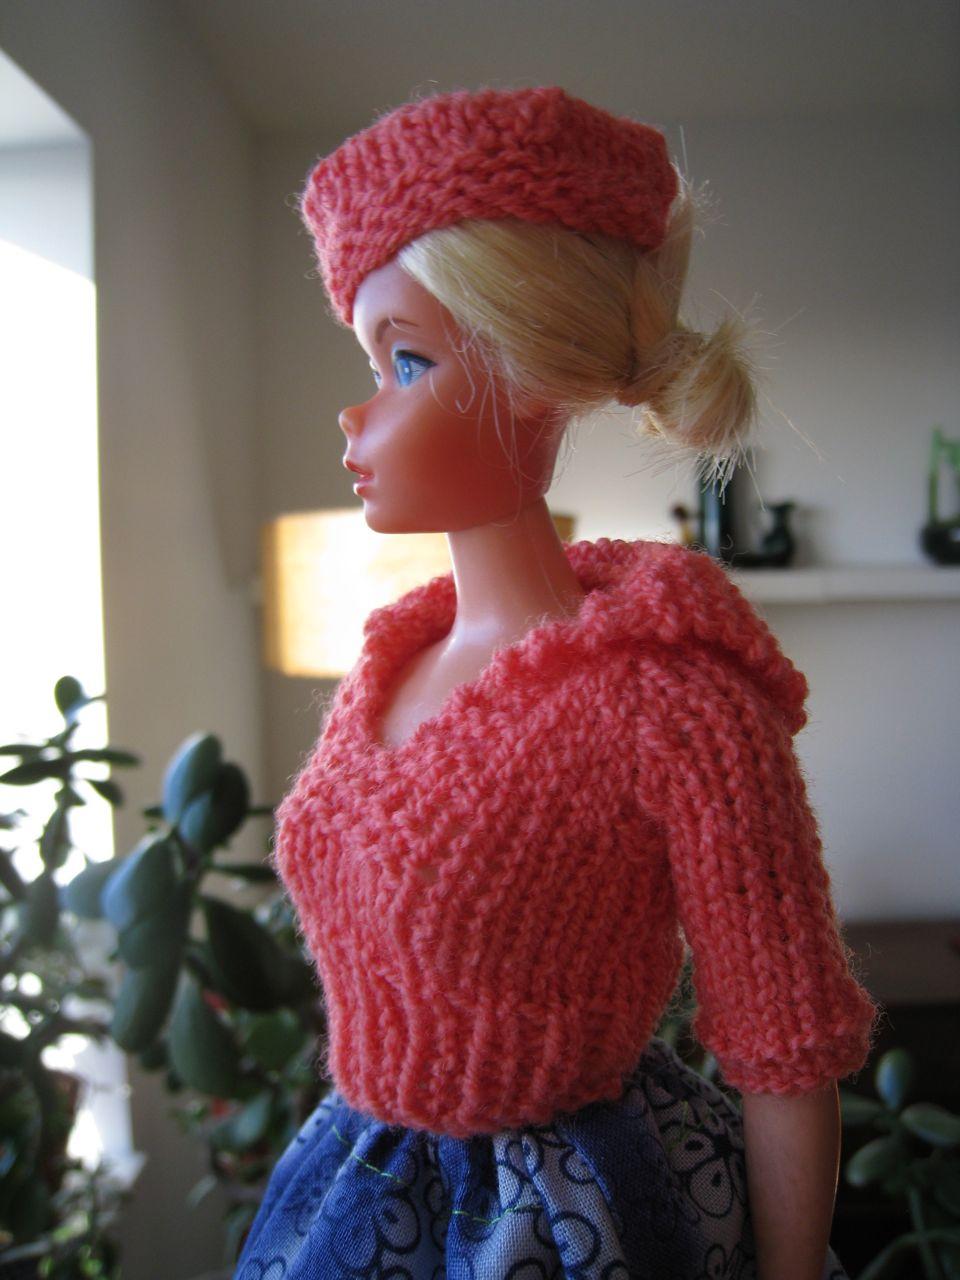 Best Barbie Knits: February 2013